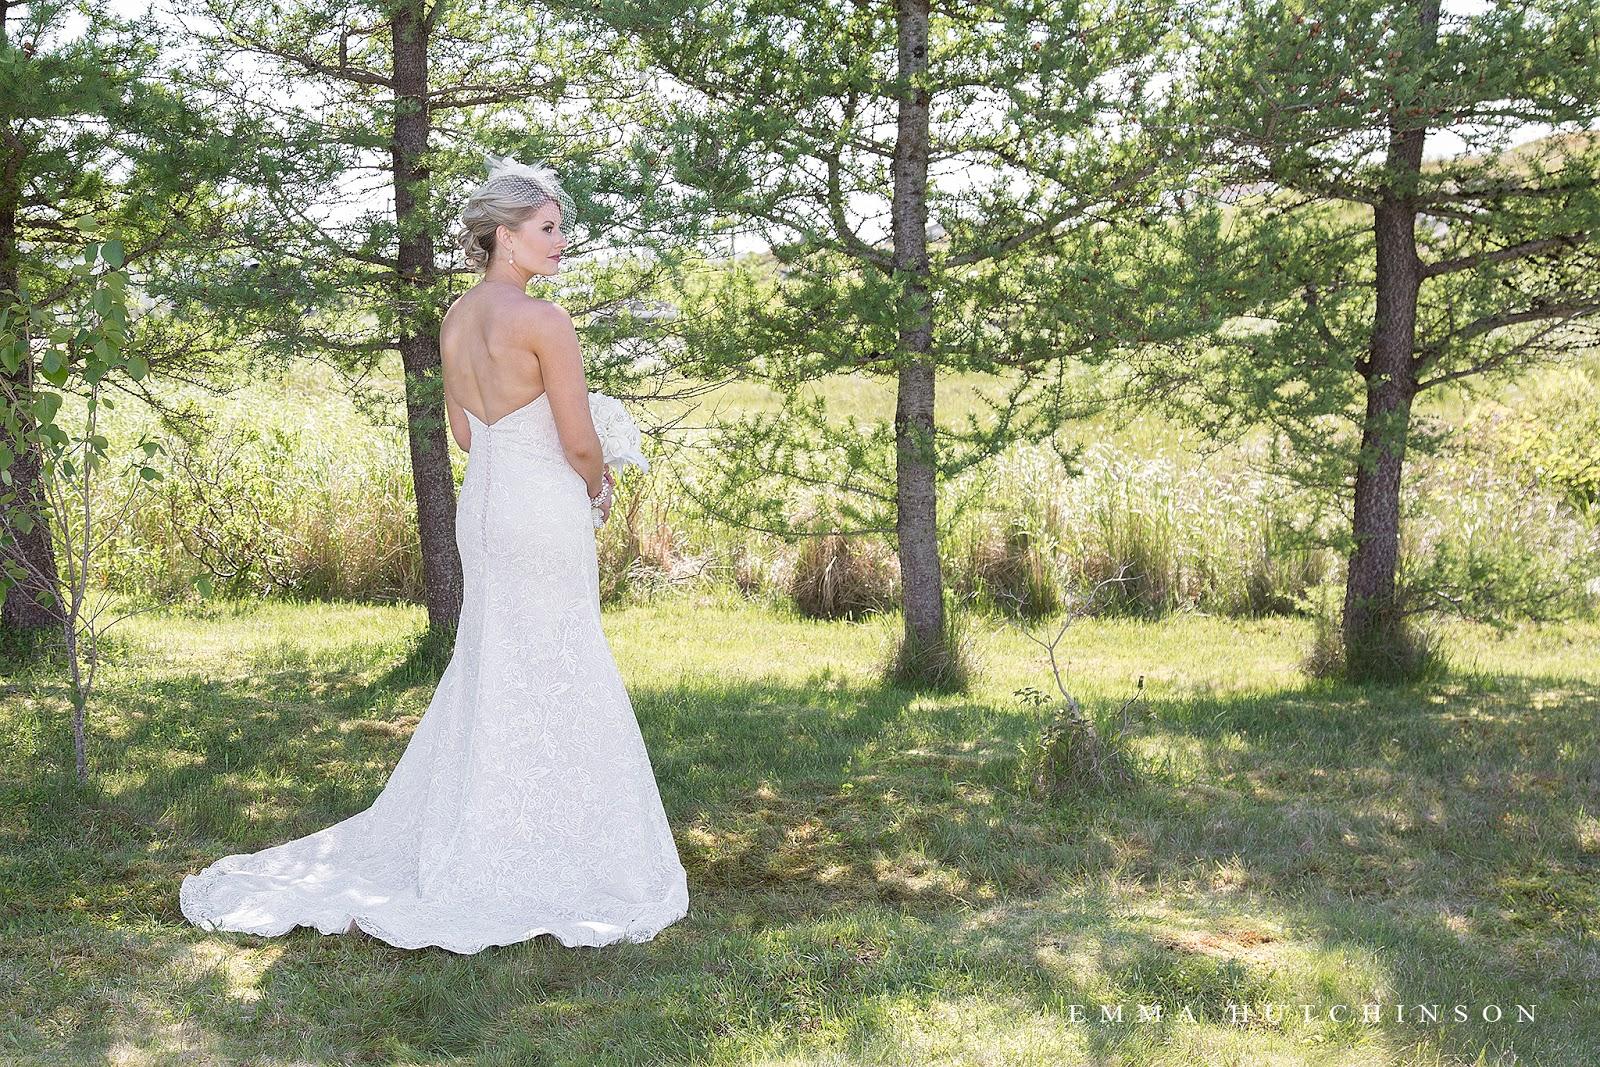 Emma Hutchinson Photography photography weddings in Central Newfoundland, St. John's, Corner Brook, Gander and Grand Falls Windsor